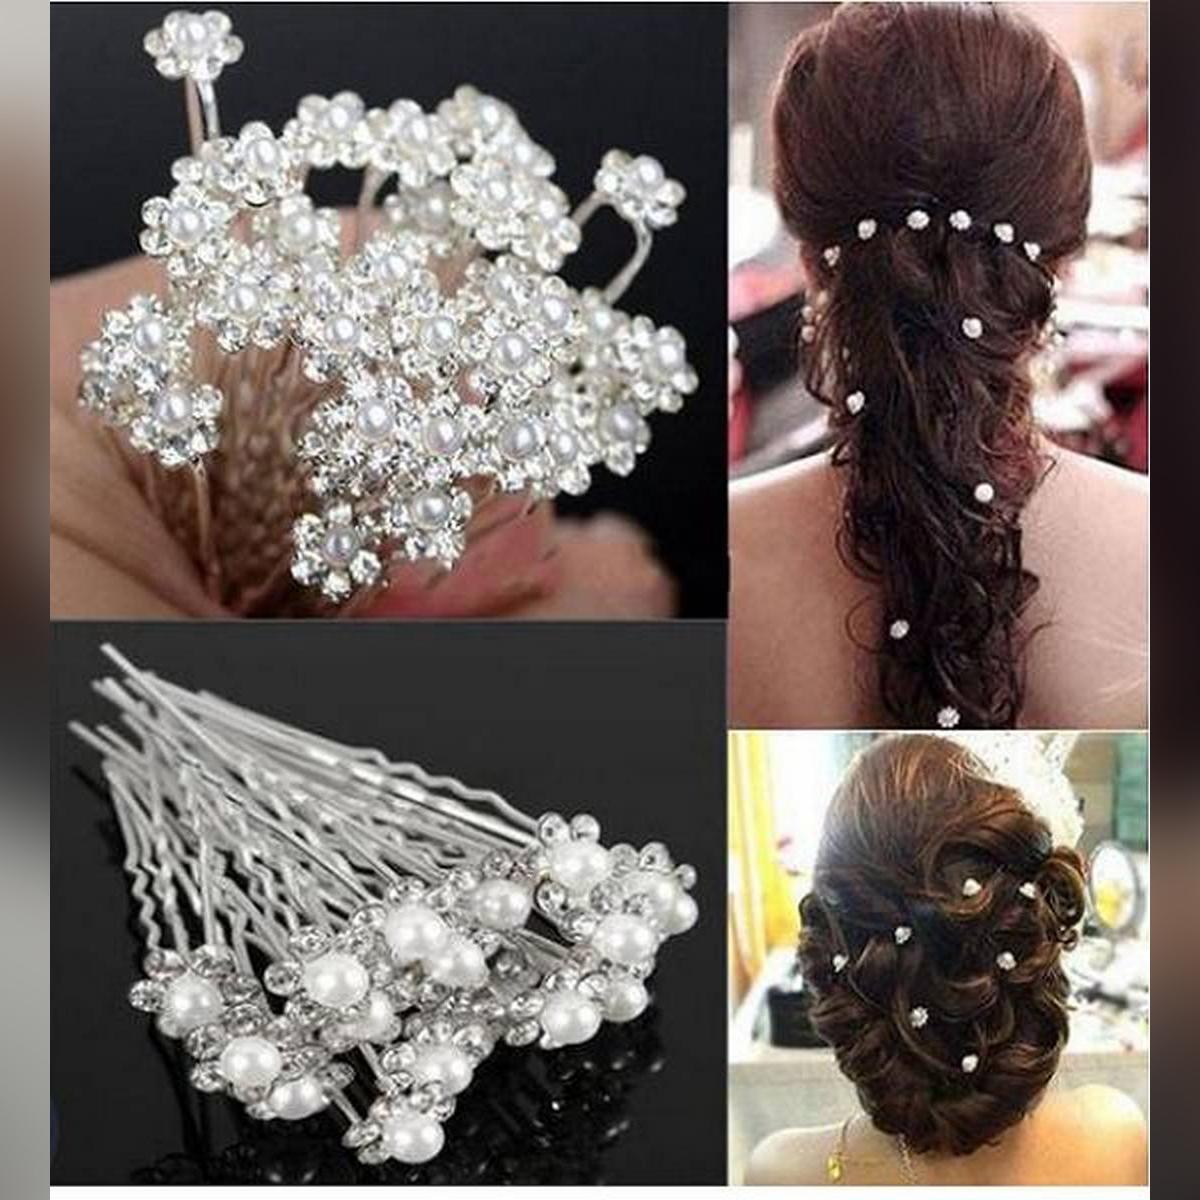 Jora Pin Stones 20PC Hairpins Wedding Women Hair Accessories Bridal